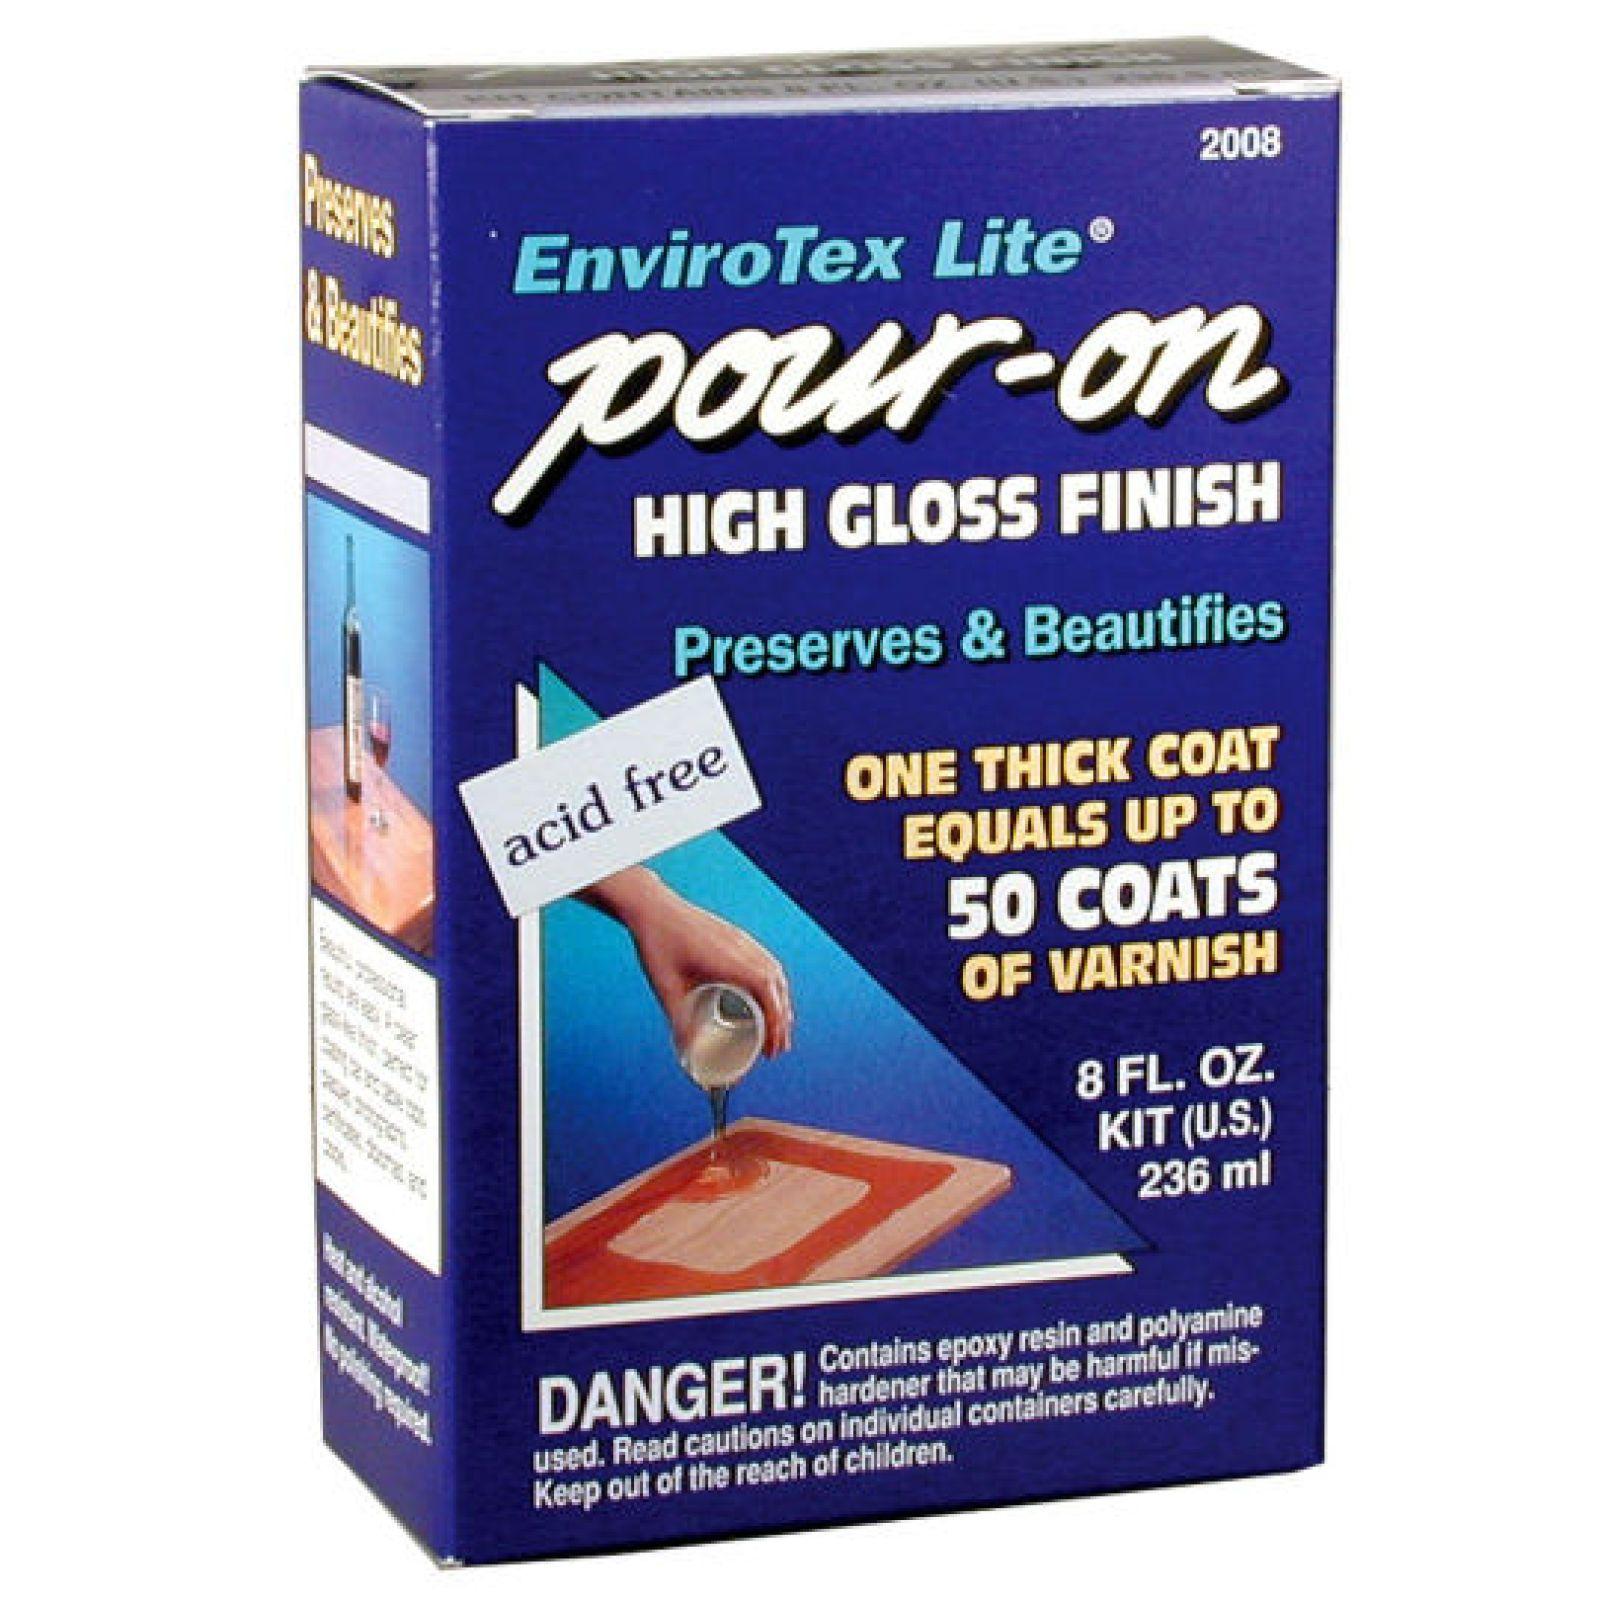 Envirotex lite pouron high gloss finish furniture woodwork